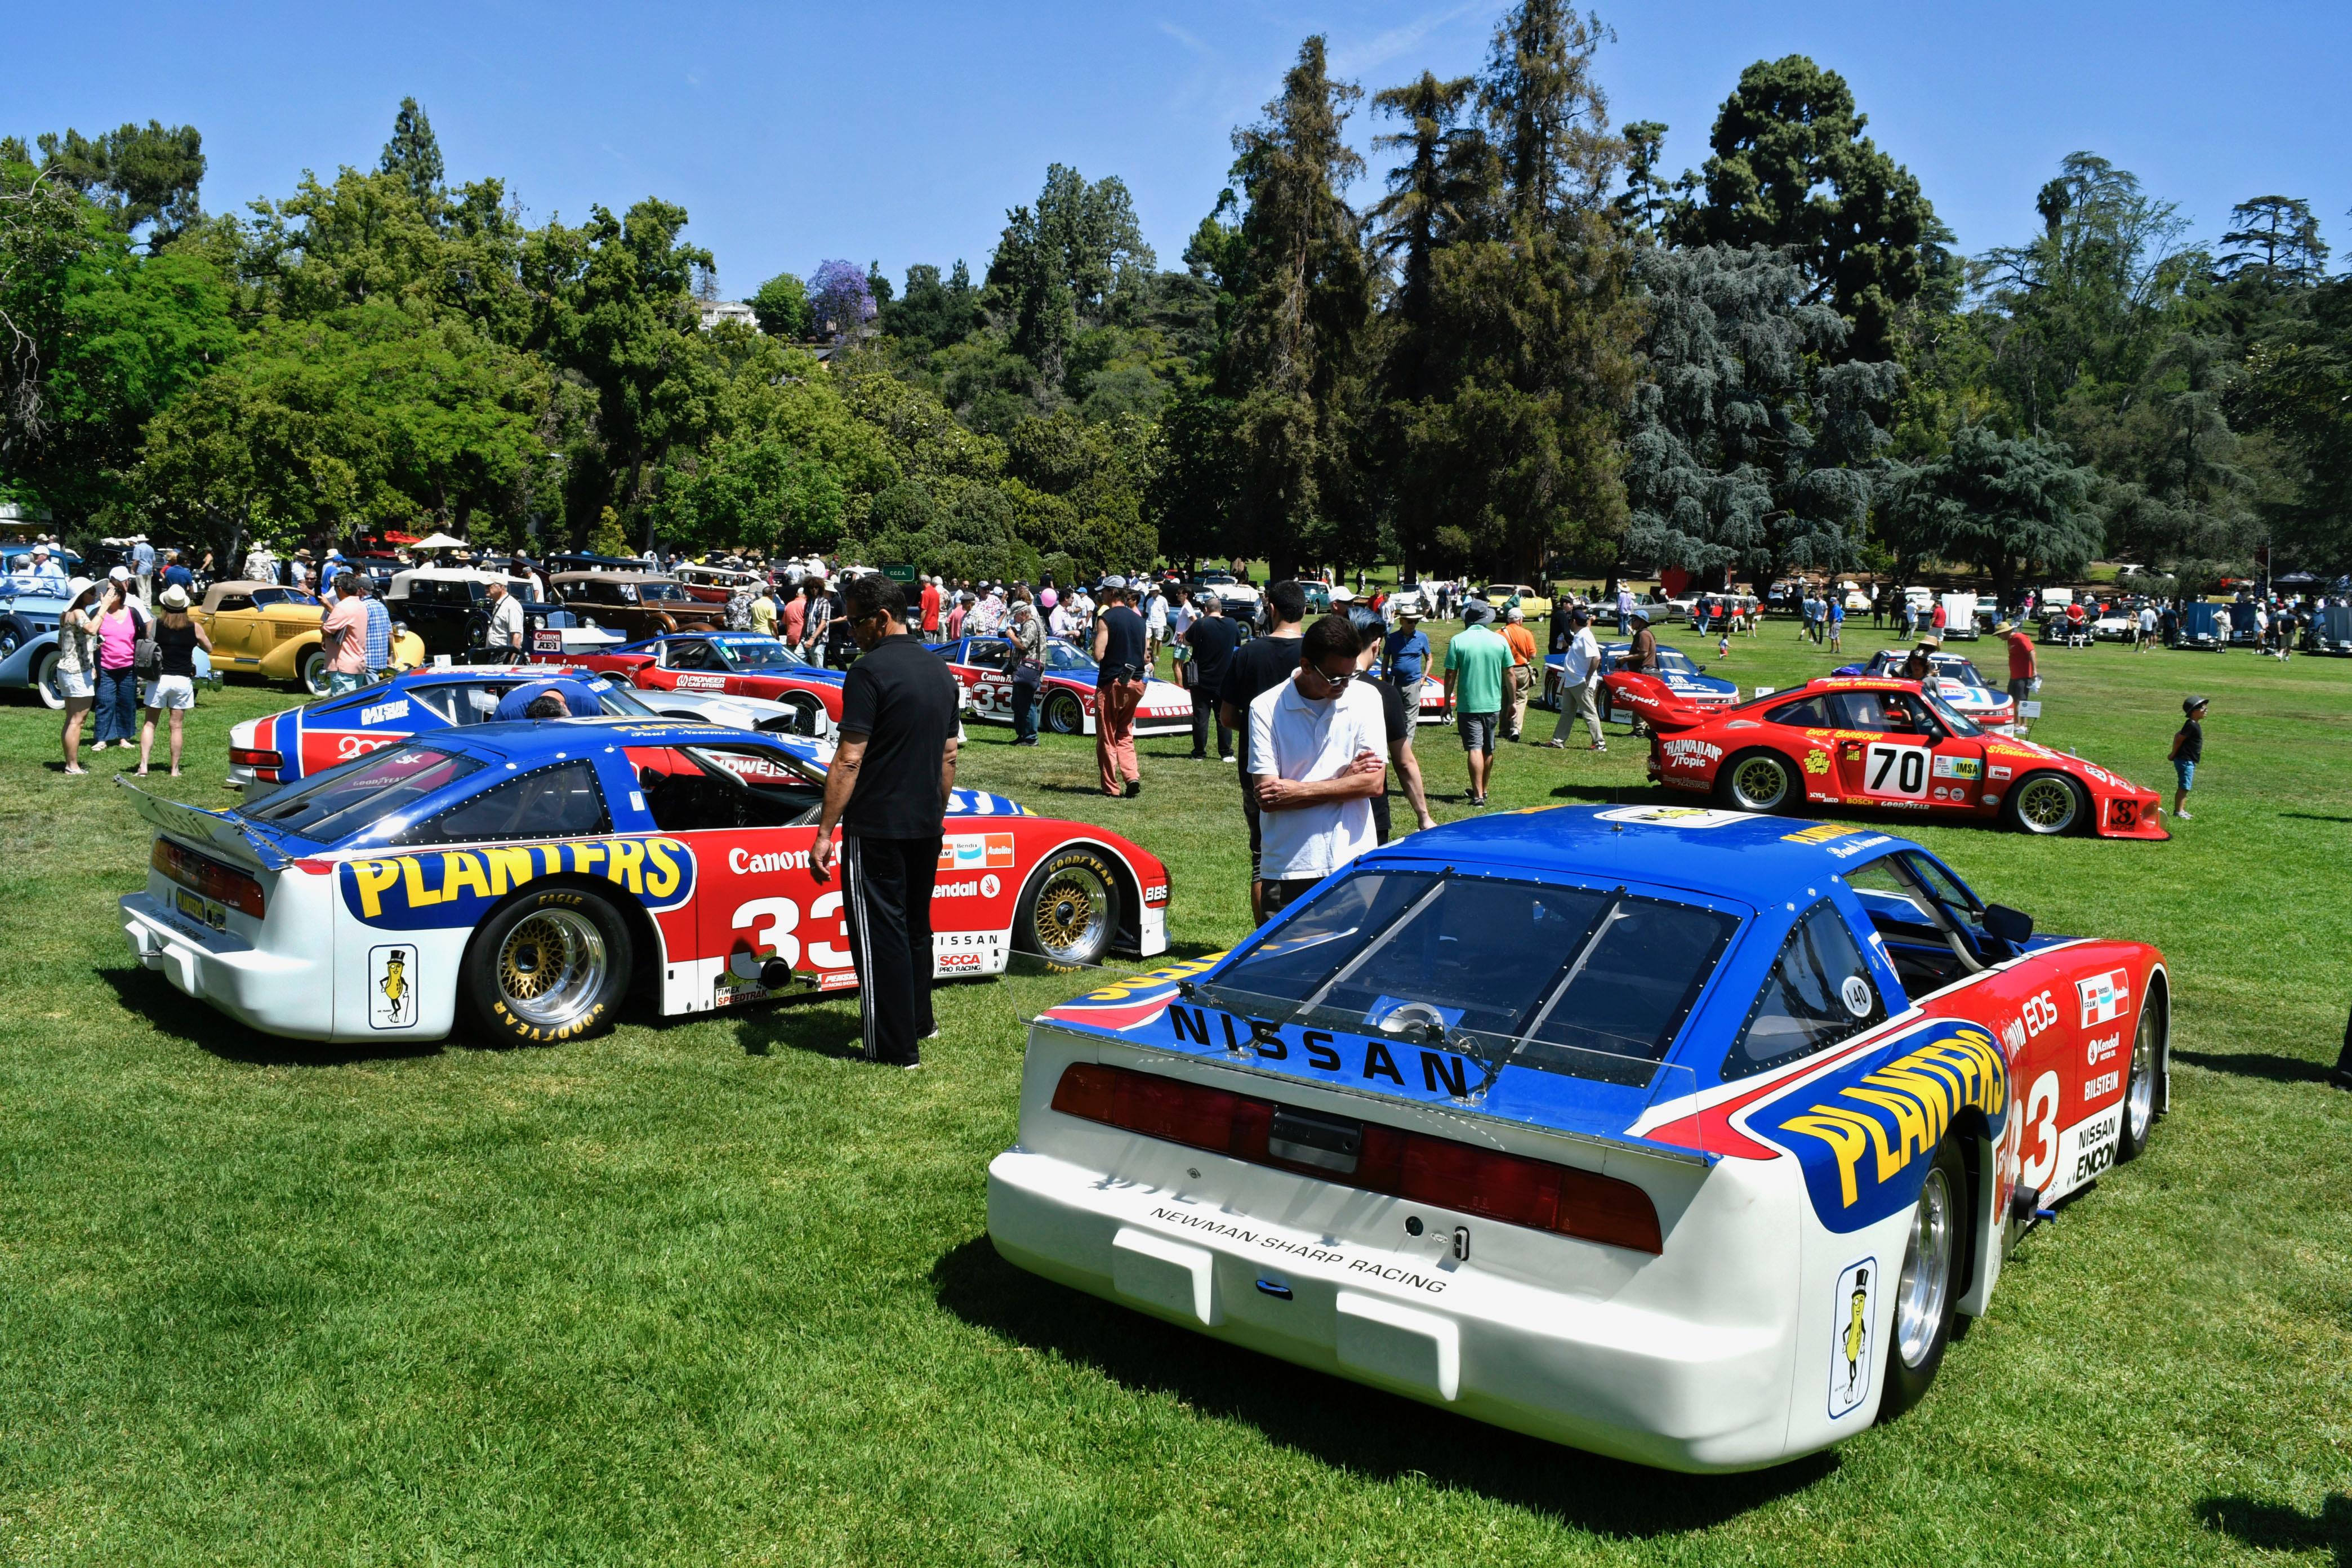 Paul Newman, Carolla collection of Paul Newman racers highlights San Marino Motor Classic, ClassicCars.com Journal